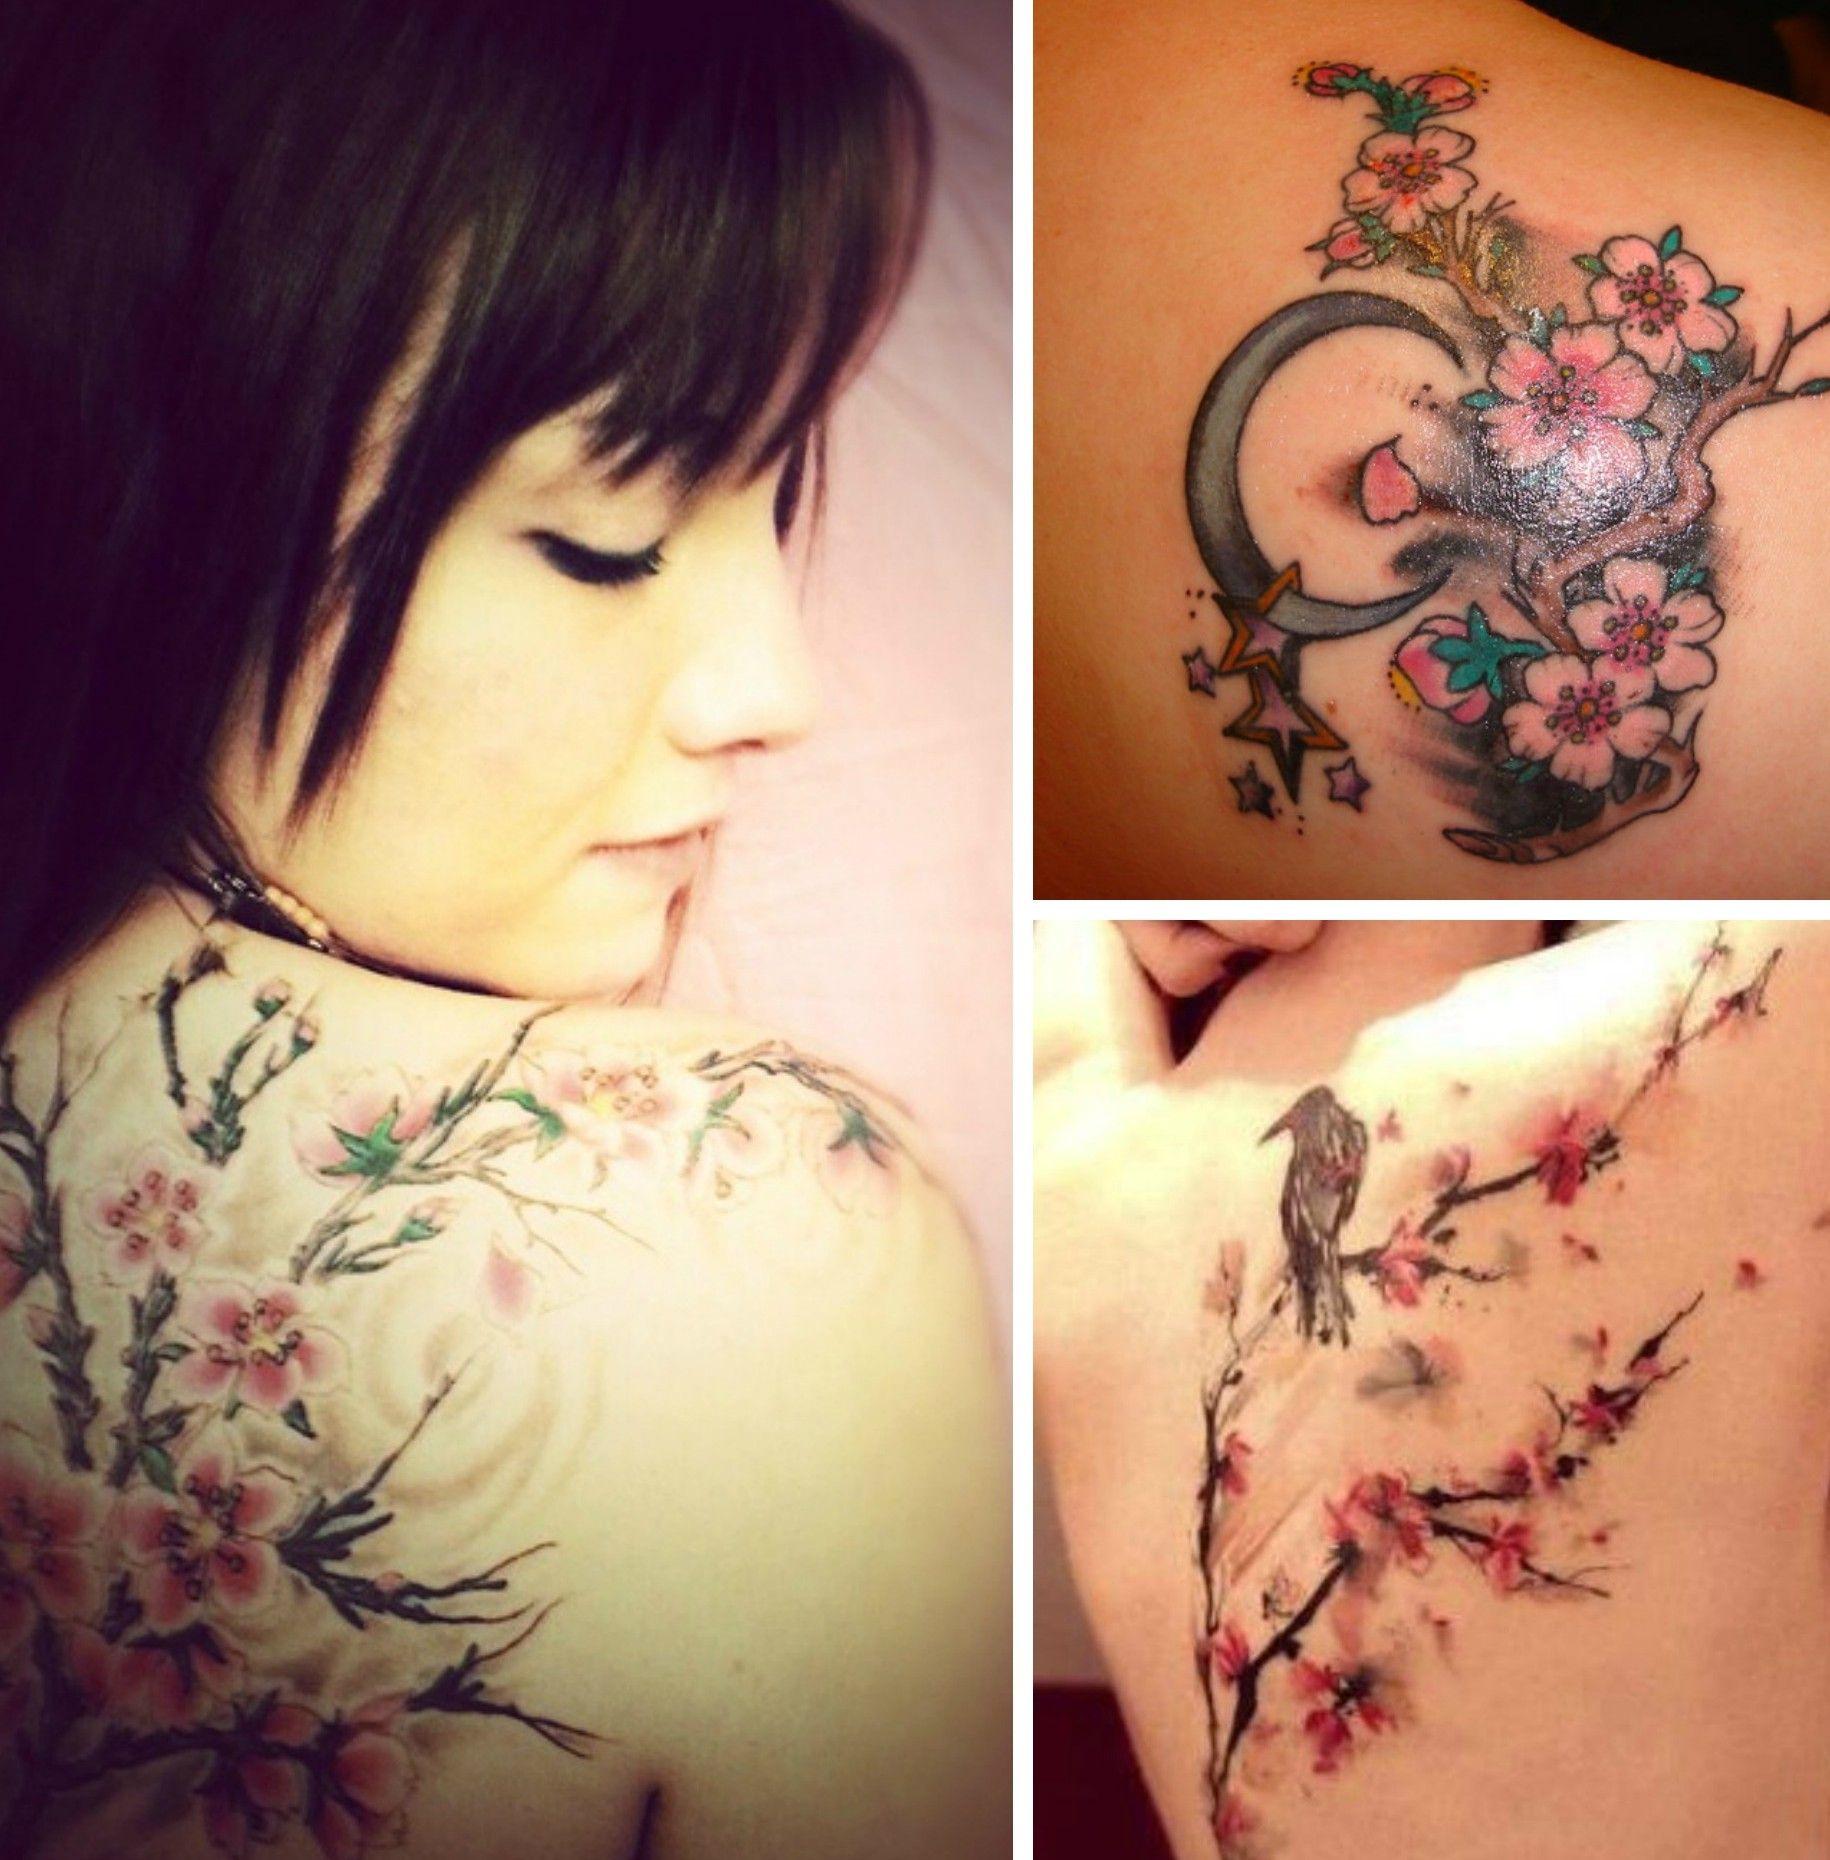 tatouage fleurs de cerisier dos | Tattoo | Pinterest | Tatoo and Tattoo